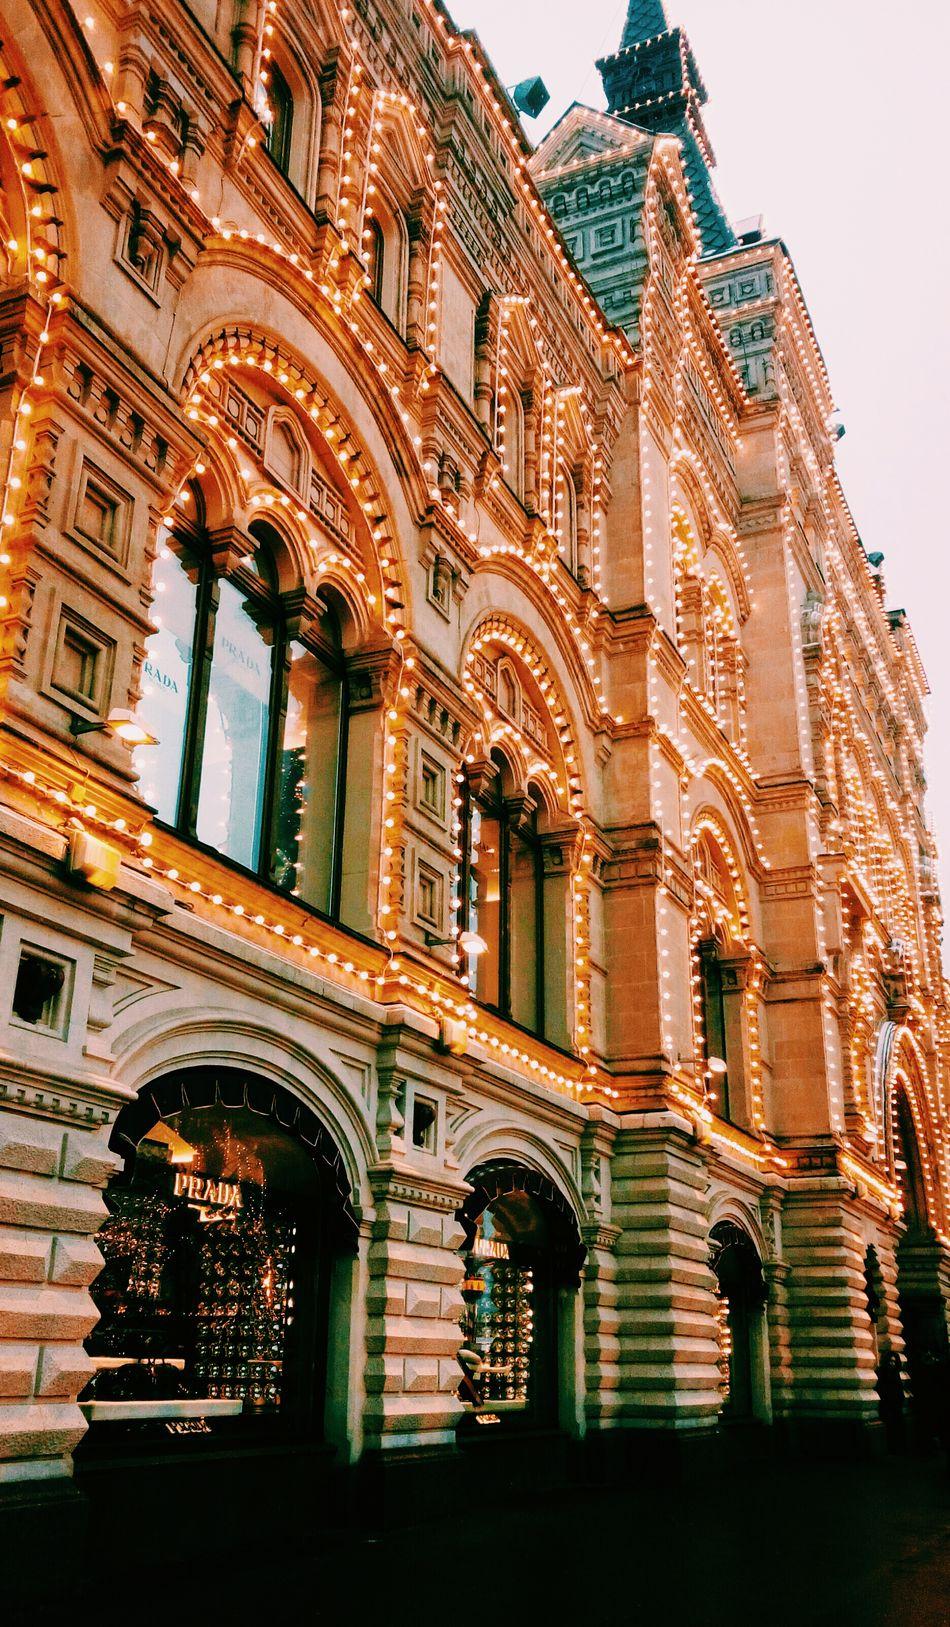 Russia Moscow Россия Москва ГУМ Gum краснаяплощадь красная площадь Redsquare Square